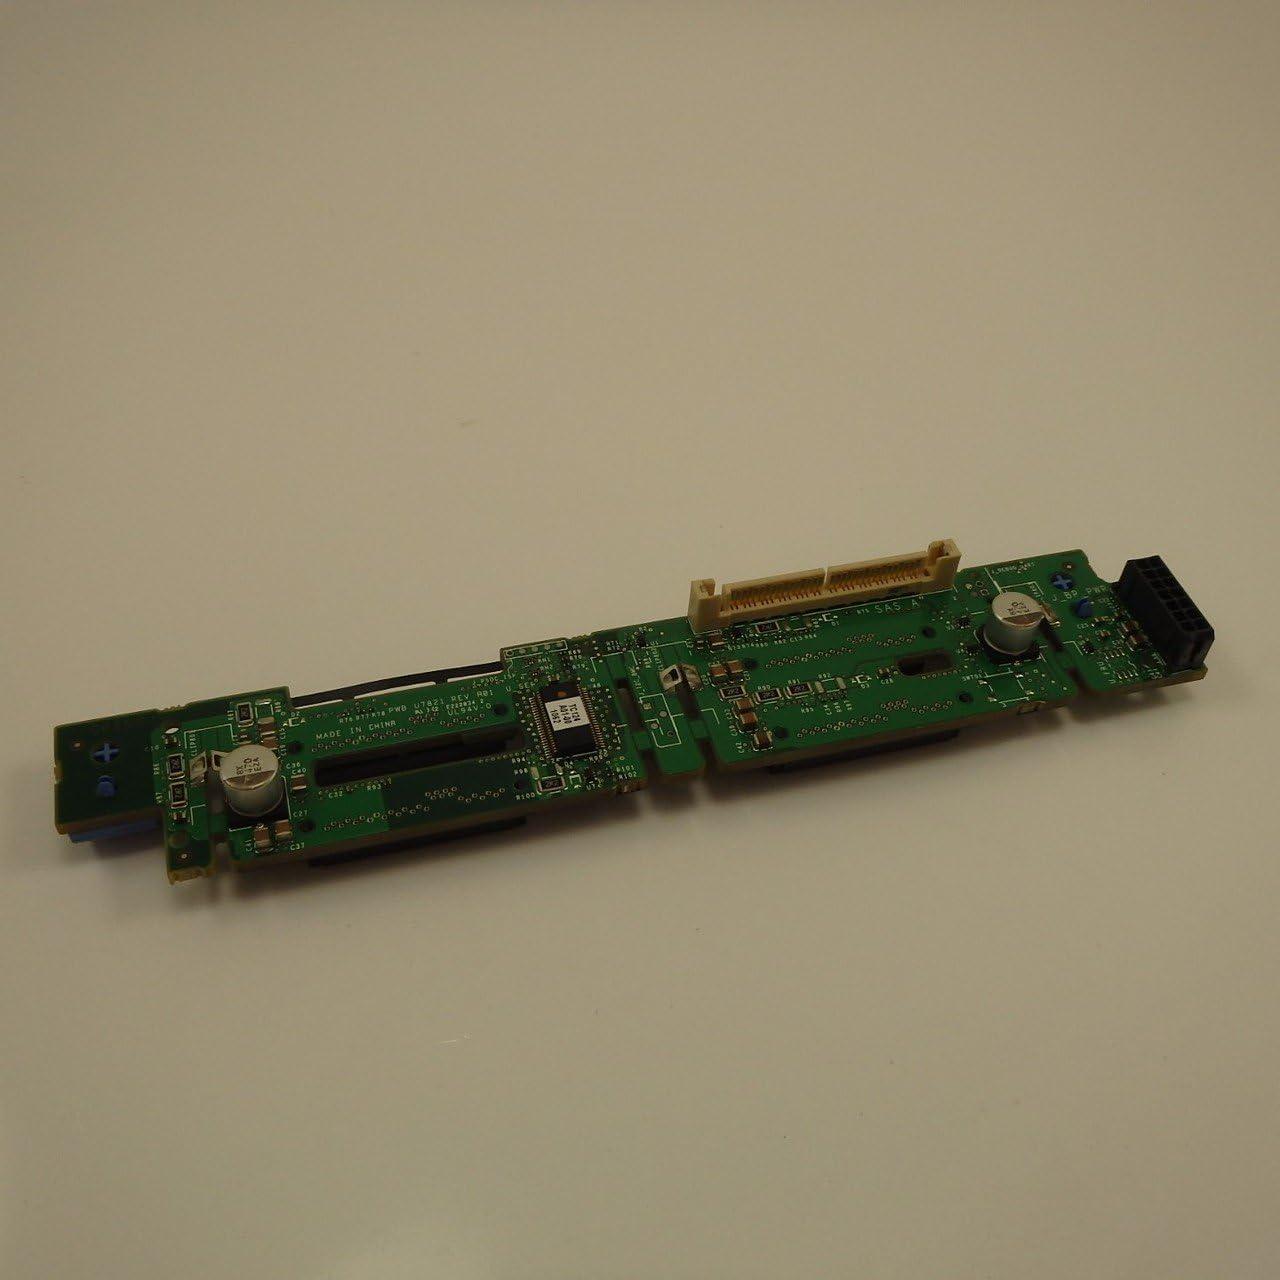 Dell Poweredge 1950 2.5 SAS x4 SAS Riser Card U7820